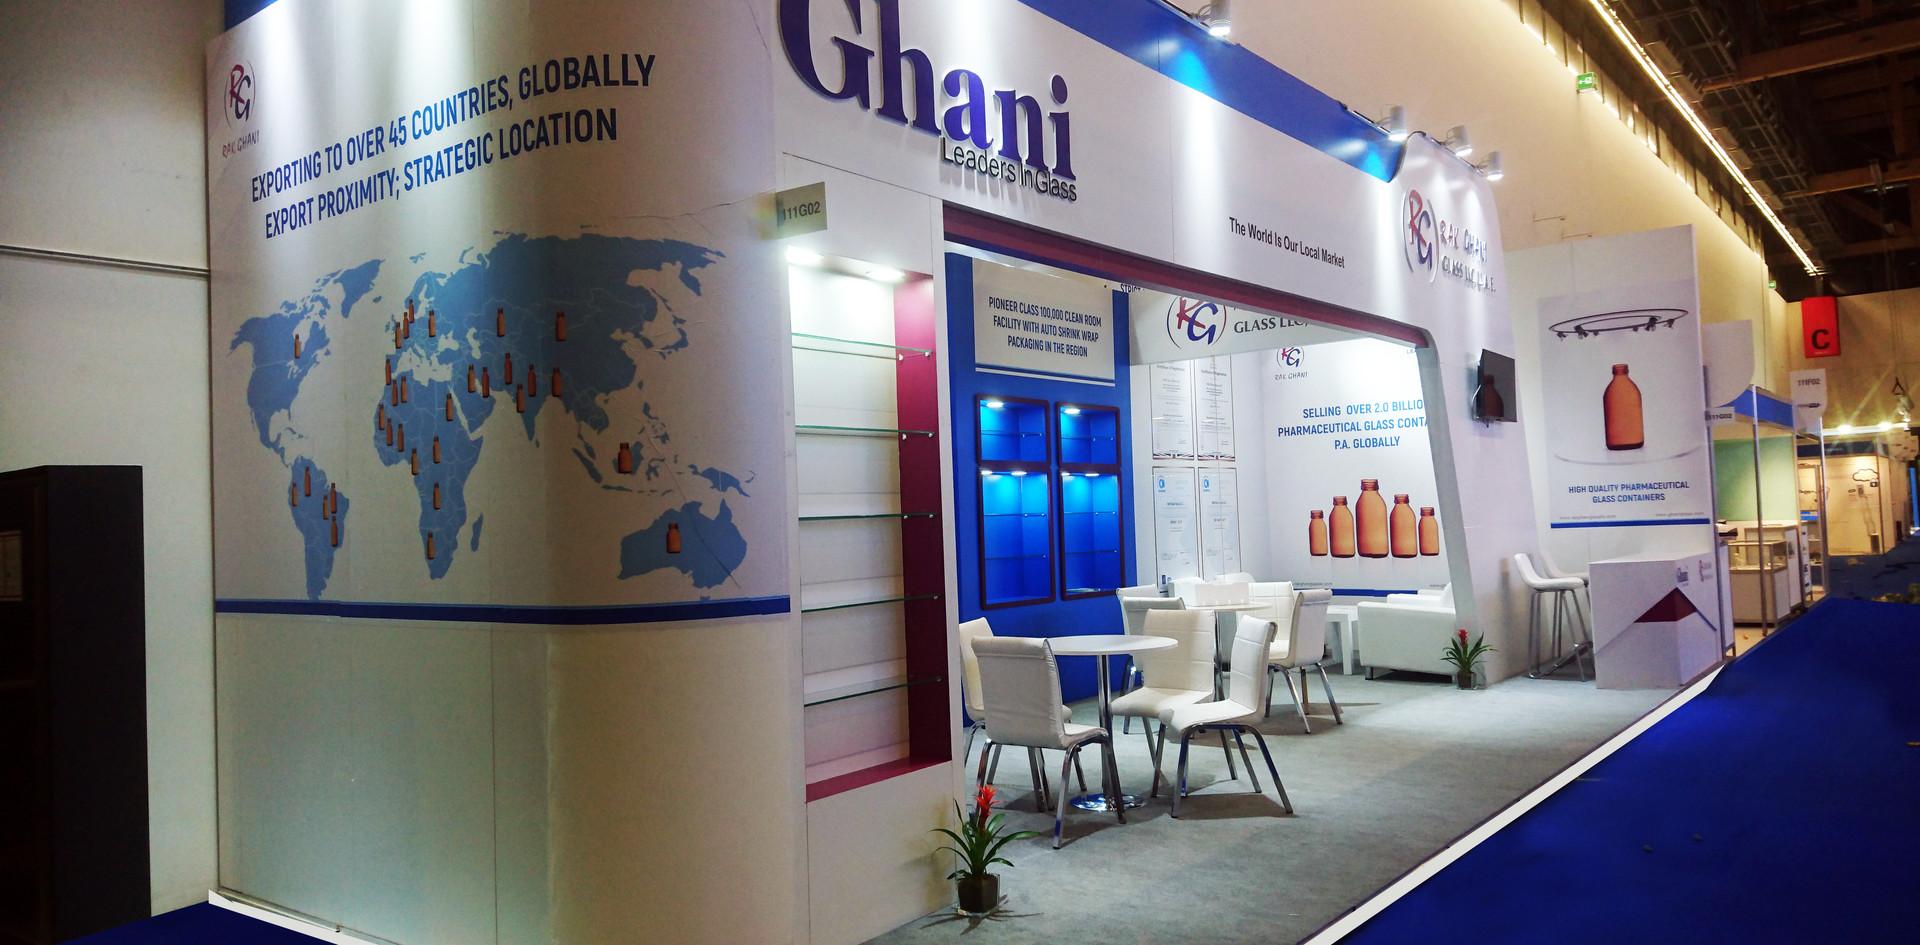 Ghani Glass company.